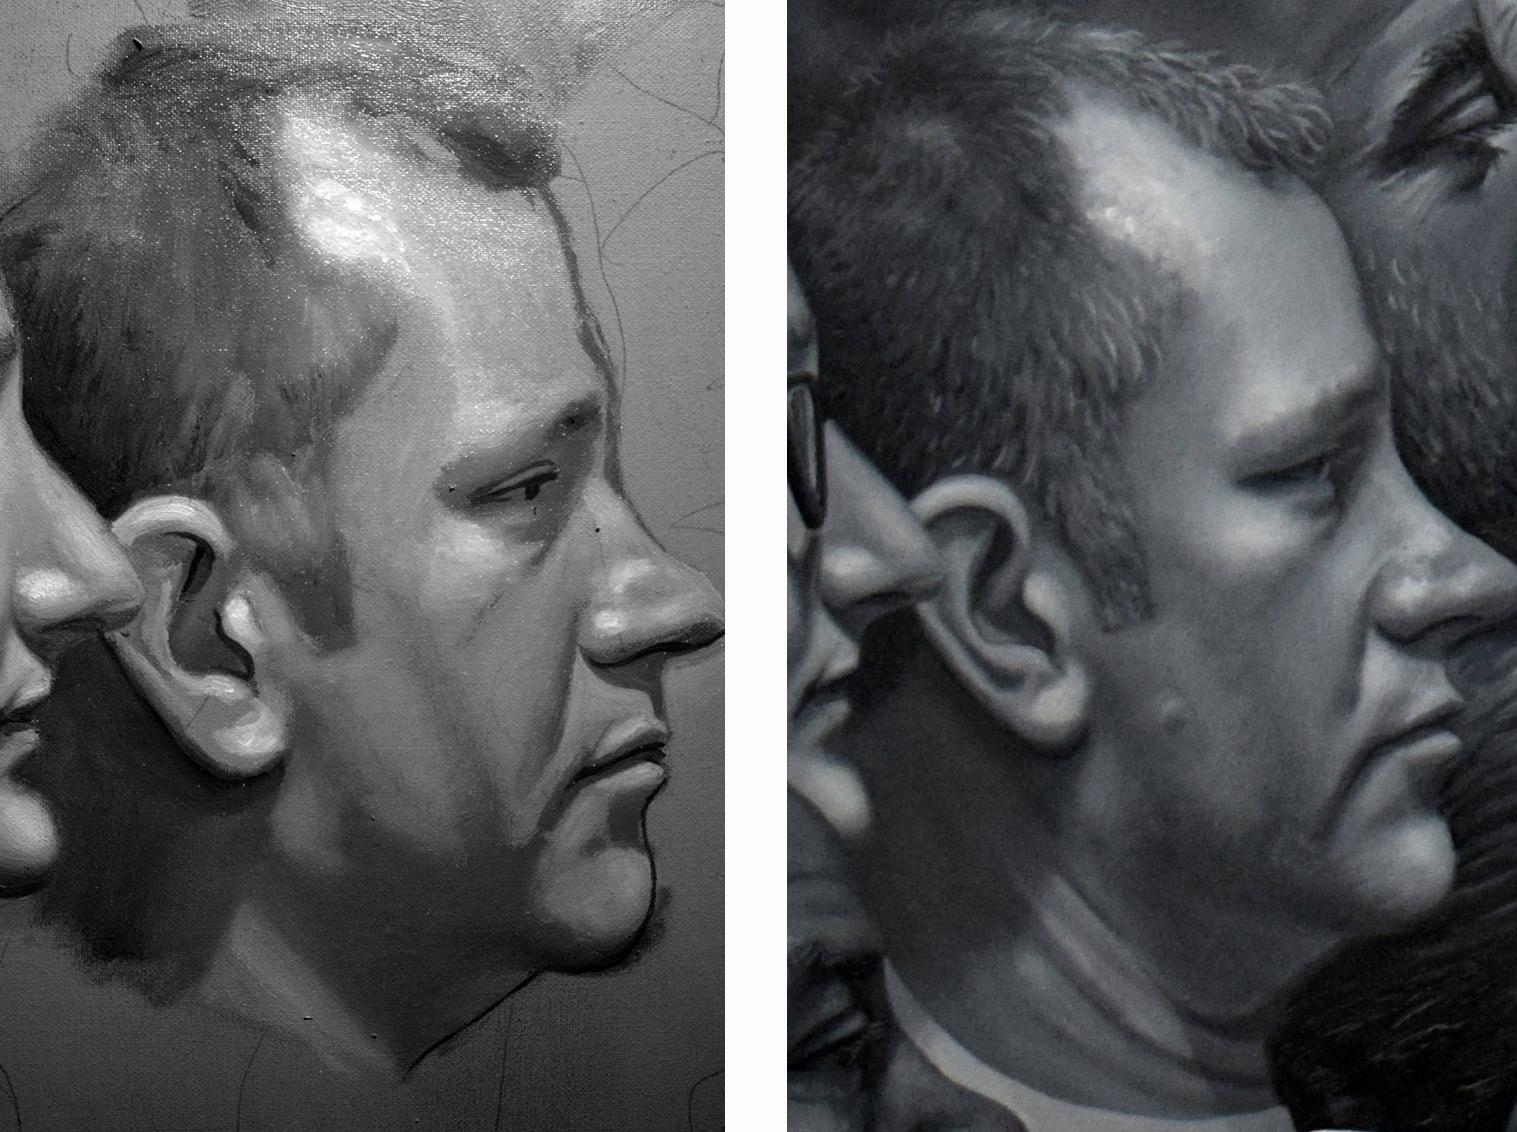 carl-randall-portrait-painting-work-in-progress.jpg